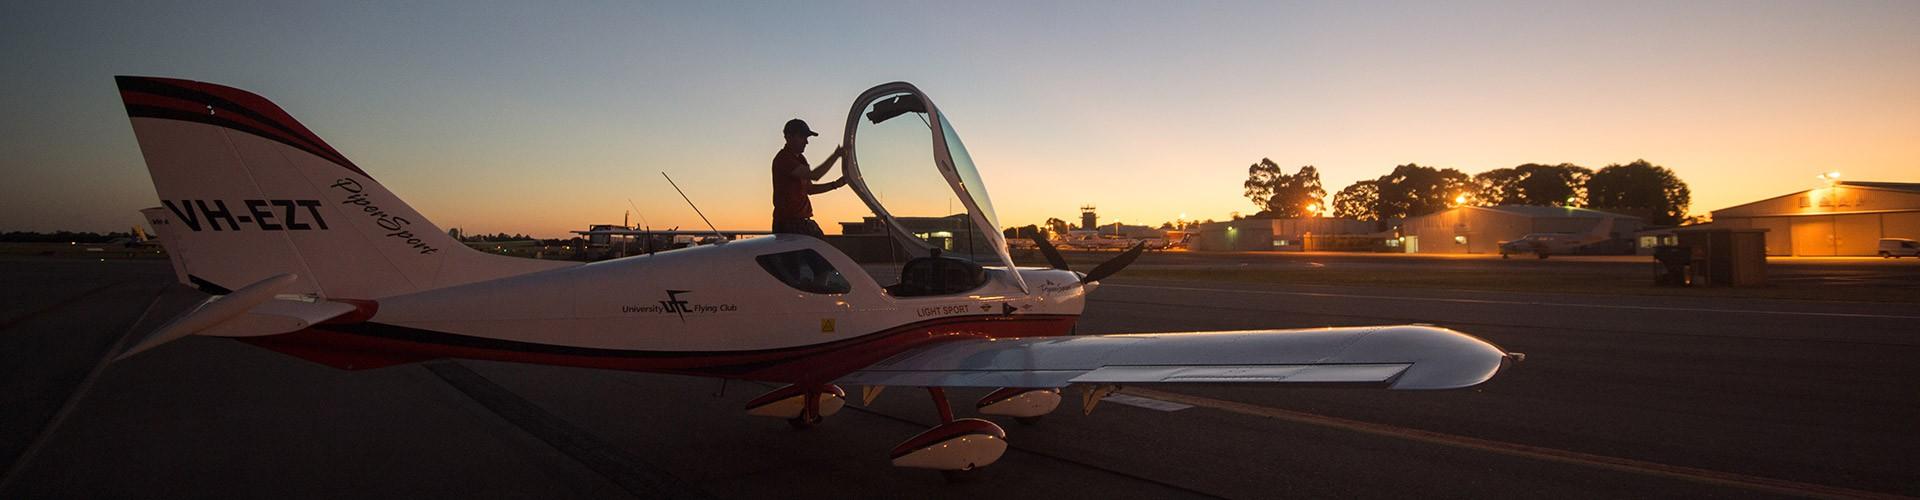 university-flying-club-jandakot-airport-learn-to-fly-vh-ezt-pipersport-sportscruiser-csa-lsa-rpl-ppl-private-pilot